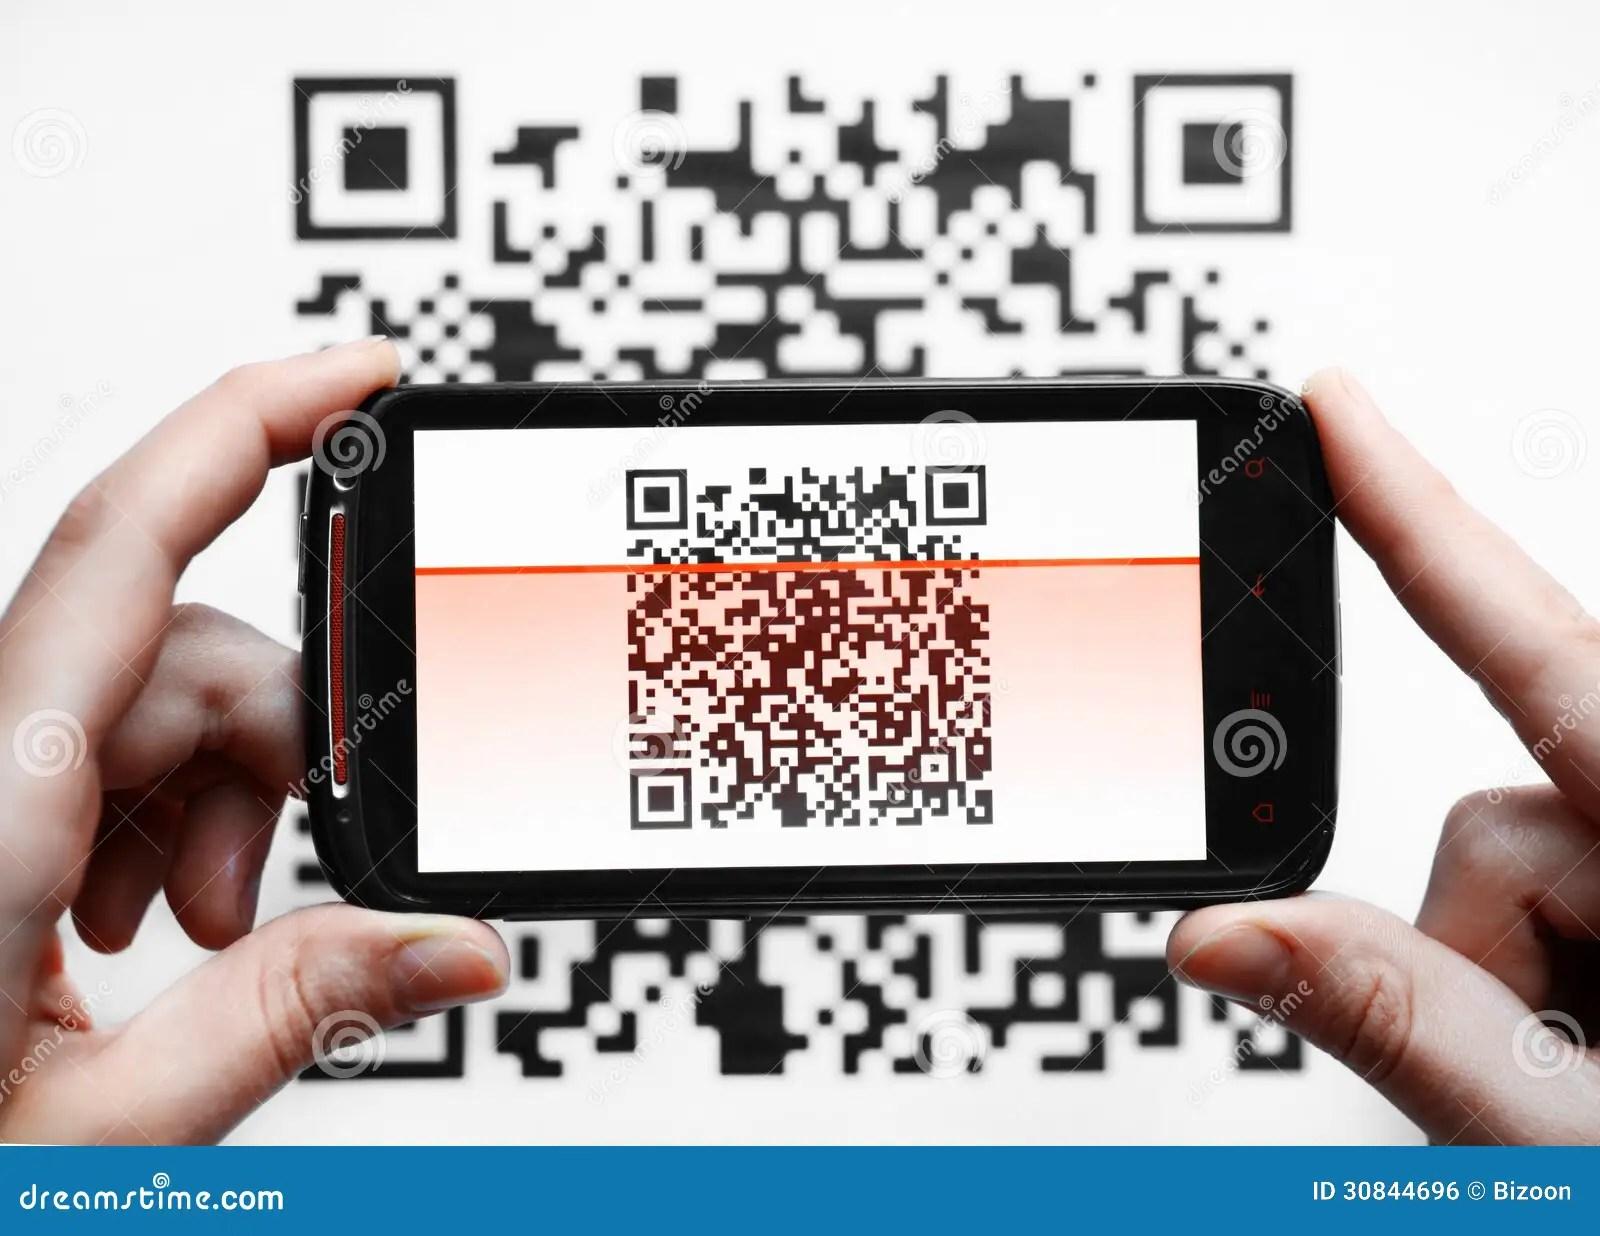 QR Code Mobile Scanner Royalty Free Stock Image Image